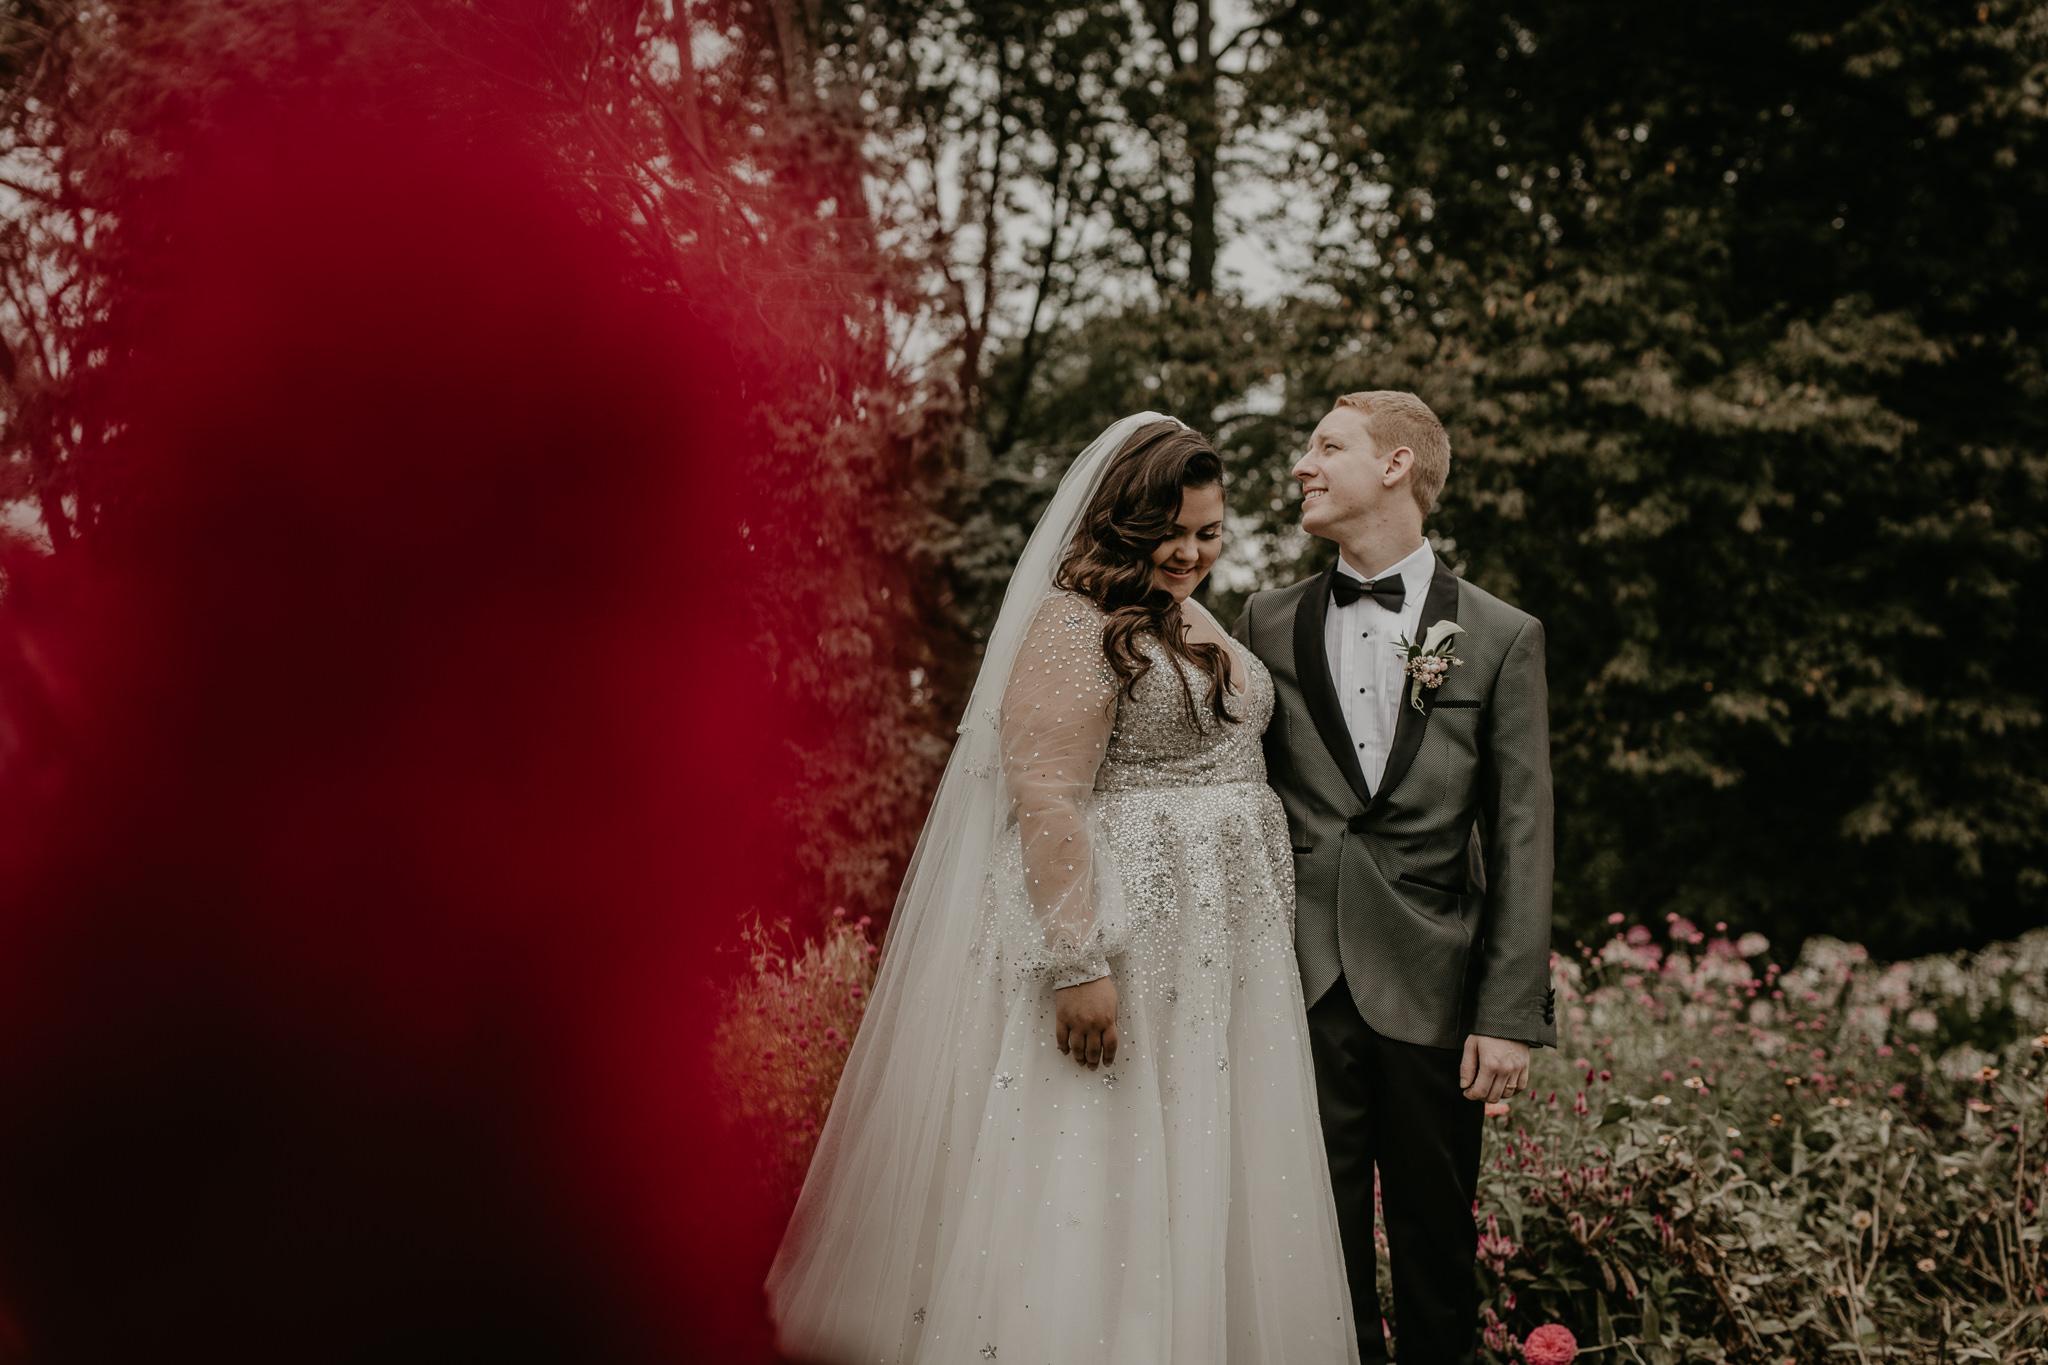 H+A_Hartford_Connecticut_RoseGarden_Wedding045.jpg